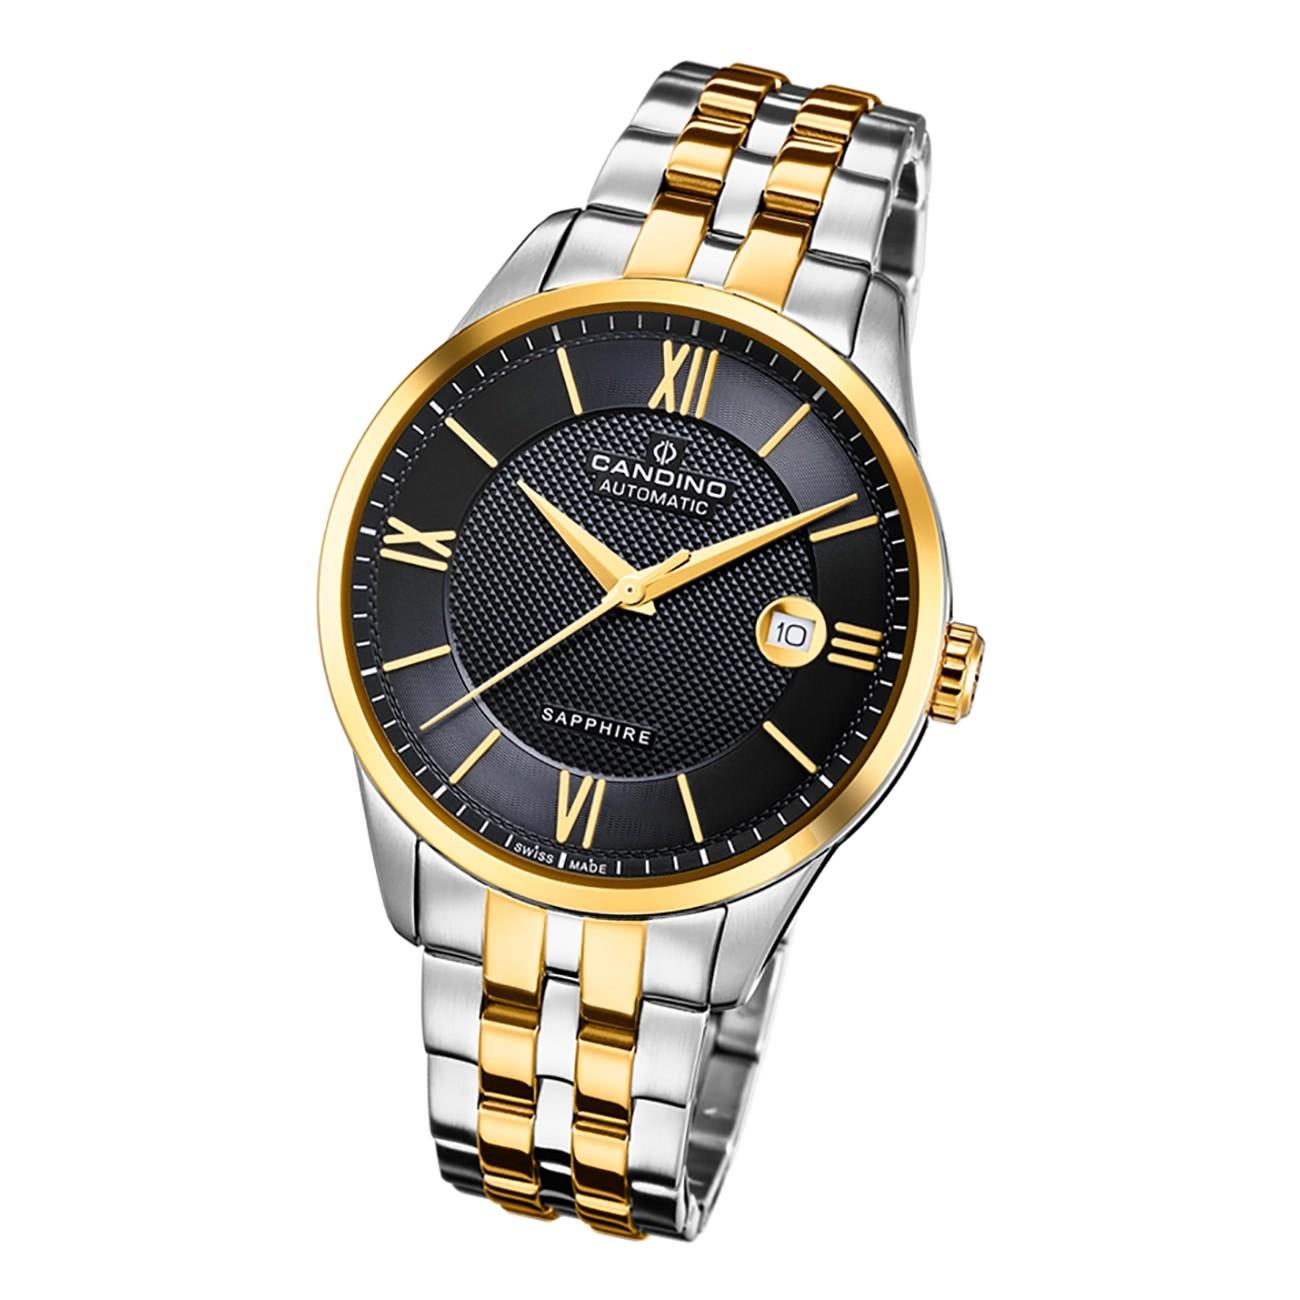 Candino Herren Armbanduhr Automatik C4706/3 Edelstahl silber gold UC4706/3